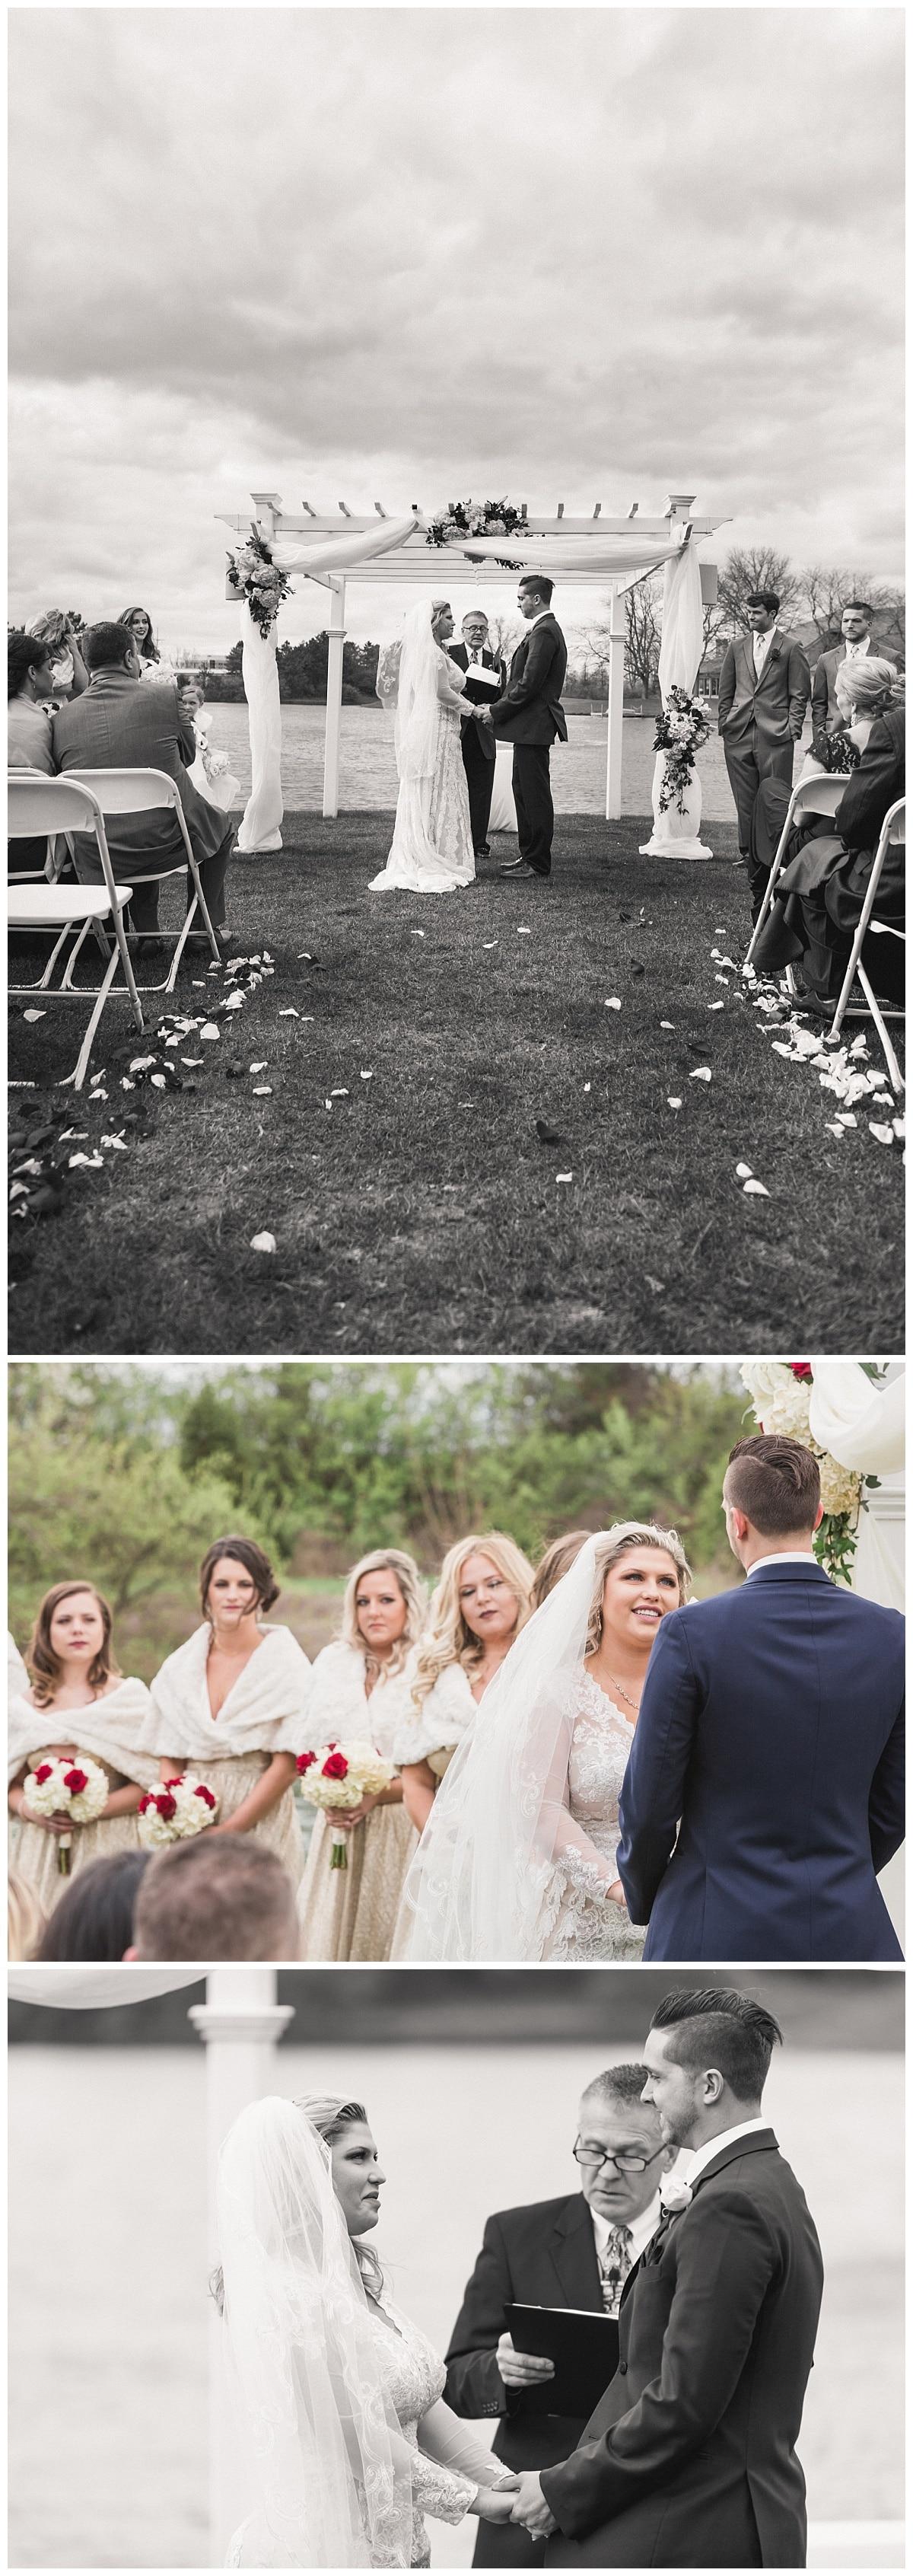 Wedding Photography - WatersEdge Event center